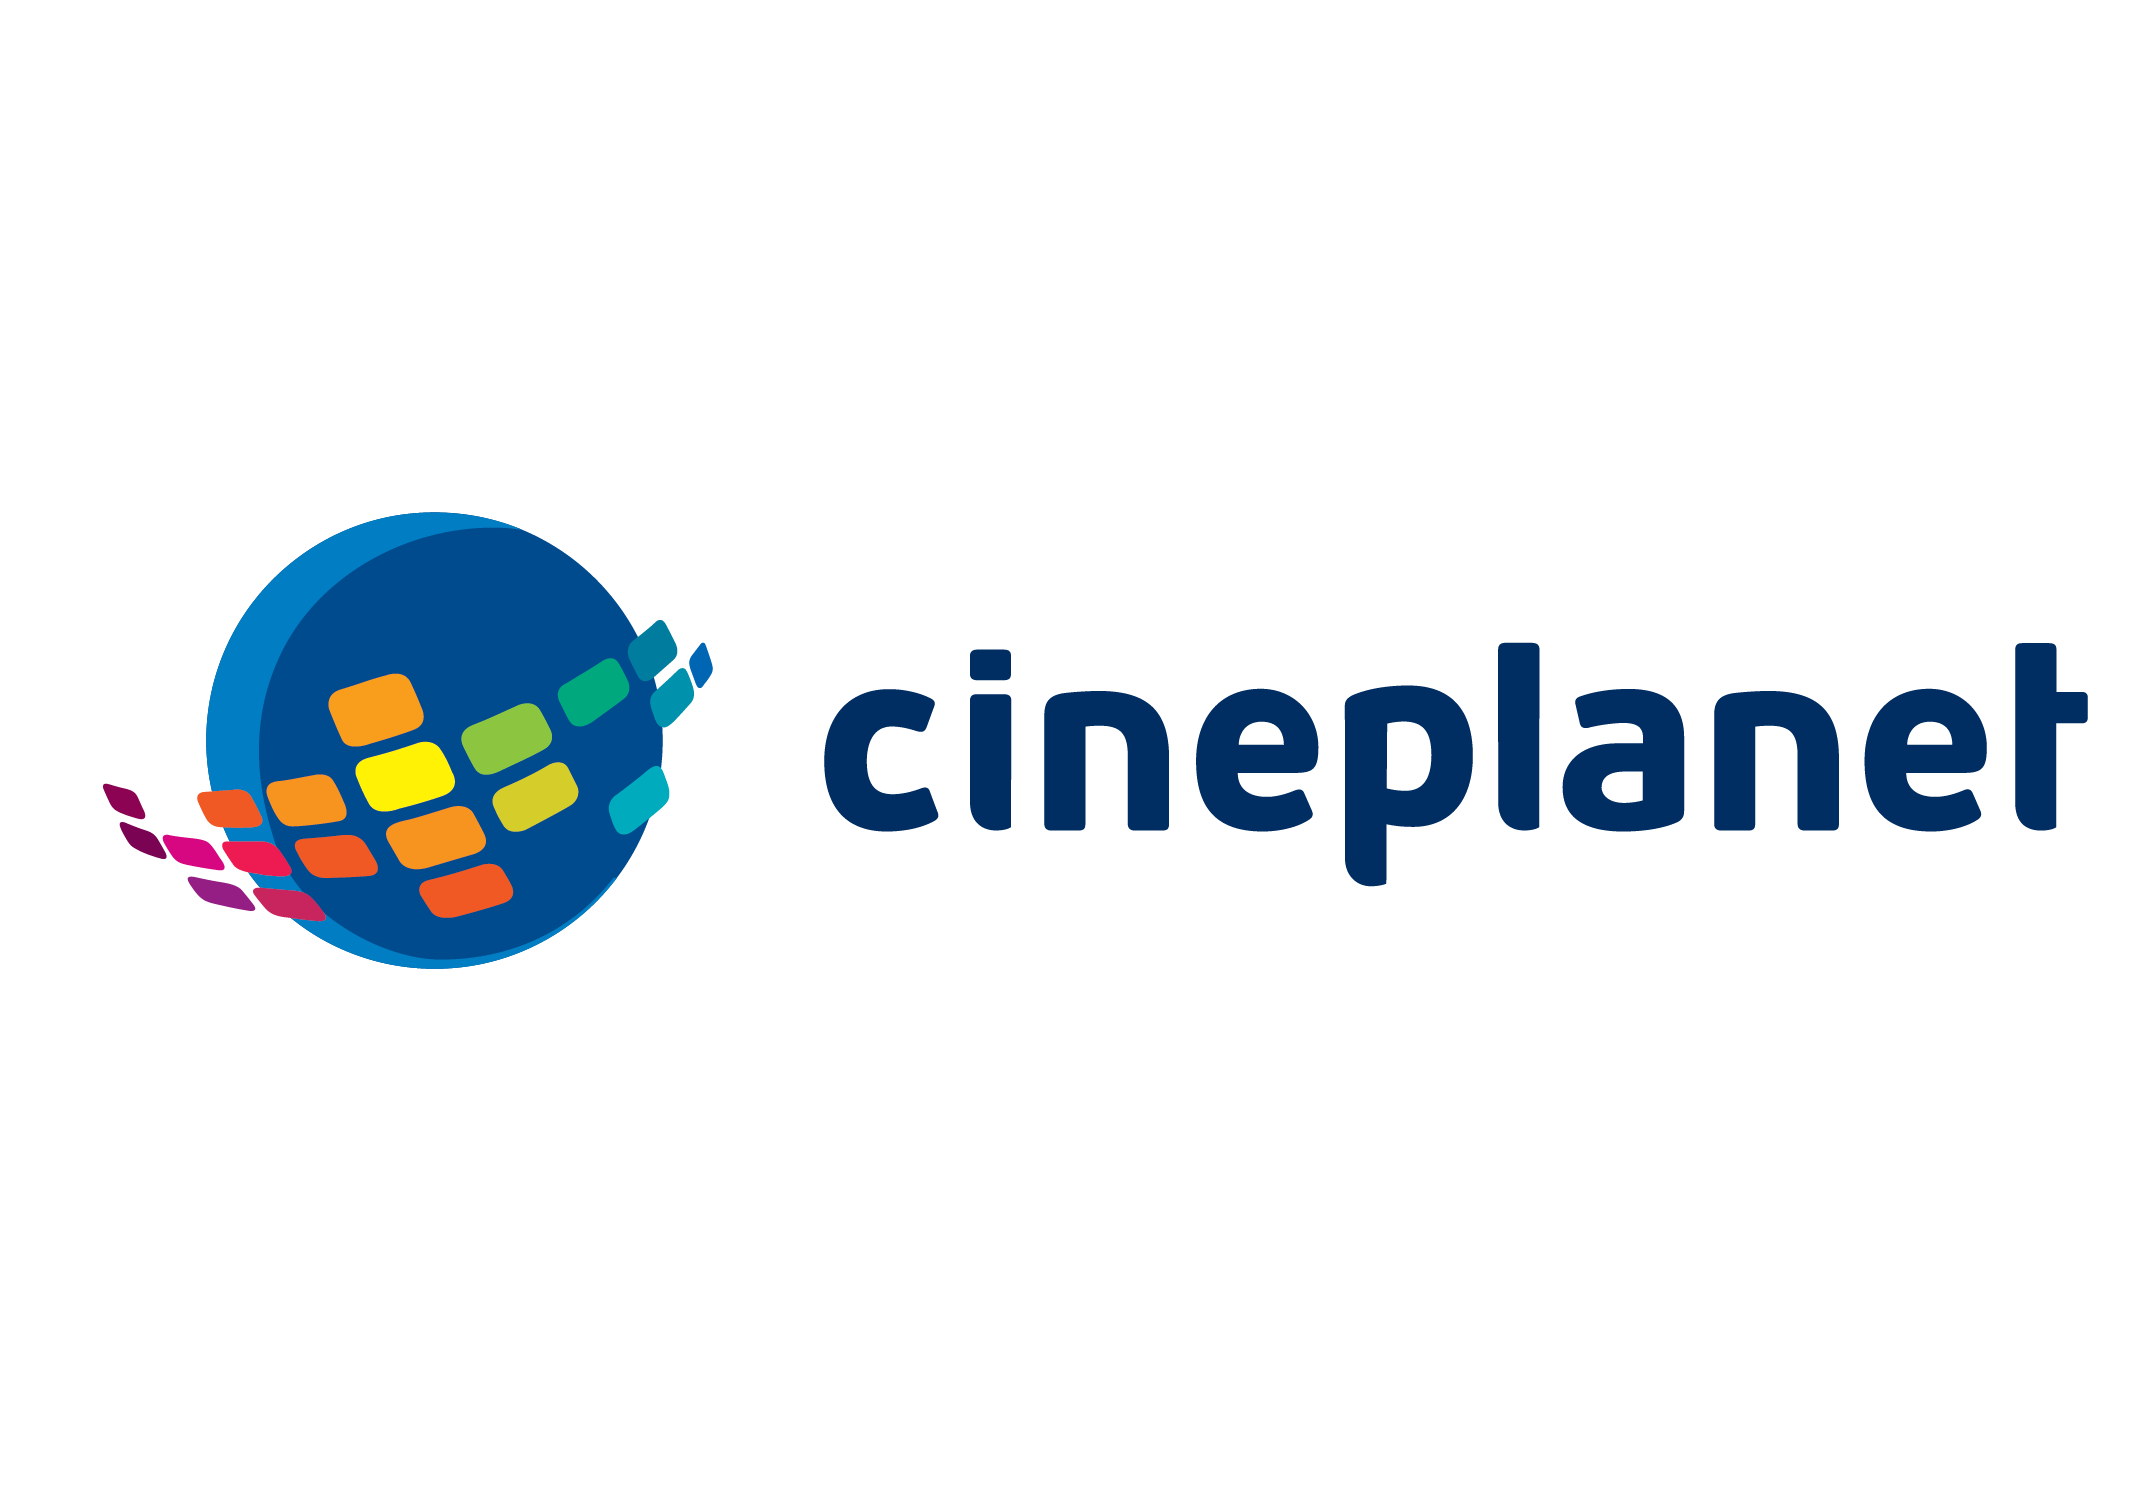 CINEPLANET - CINEPLEX